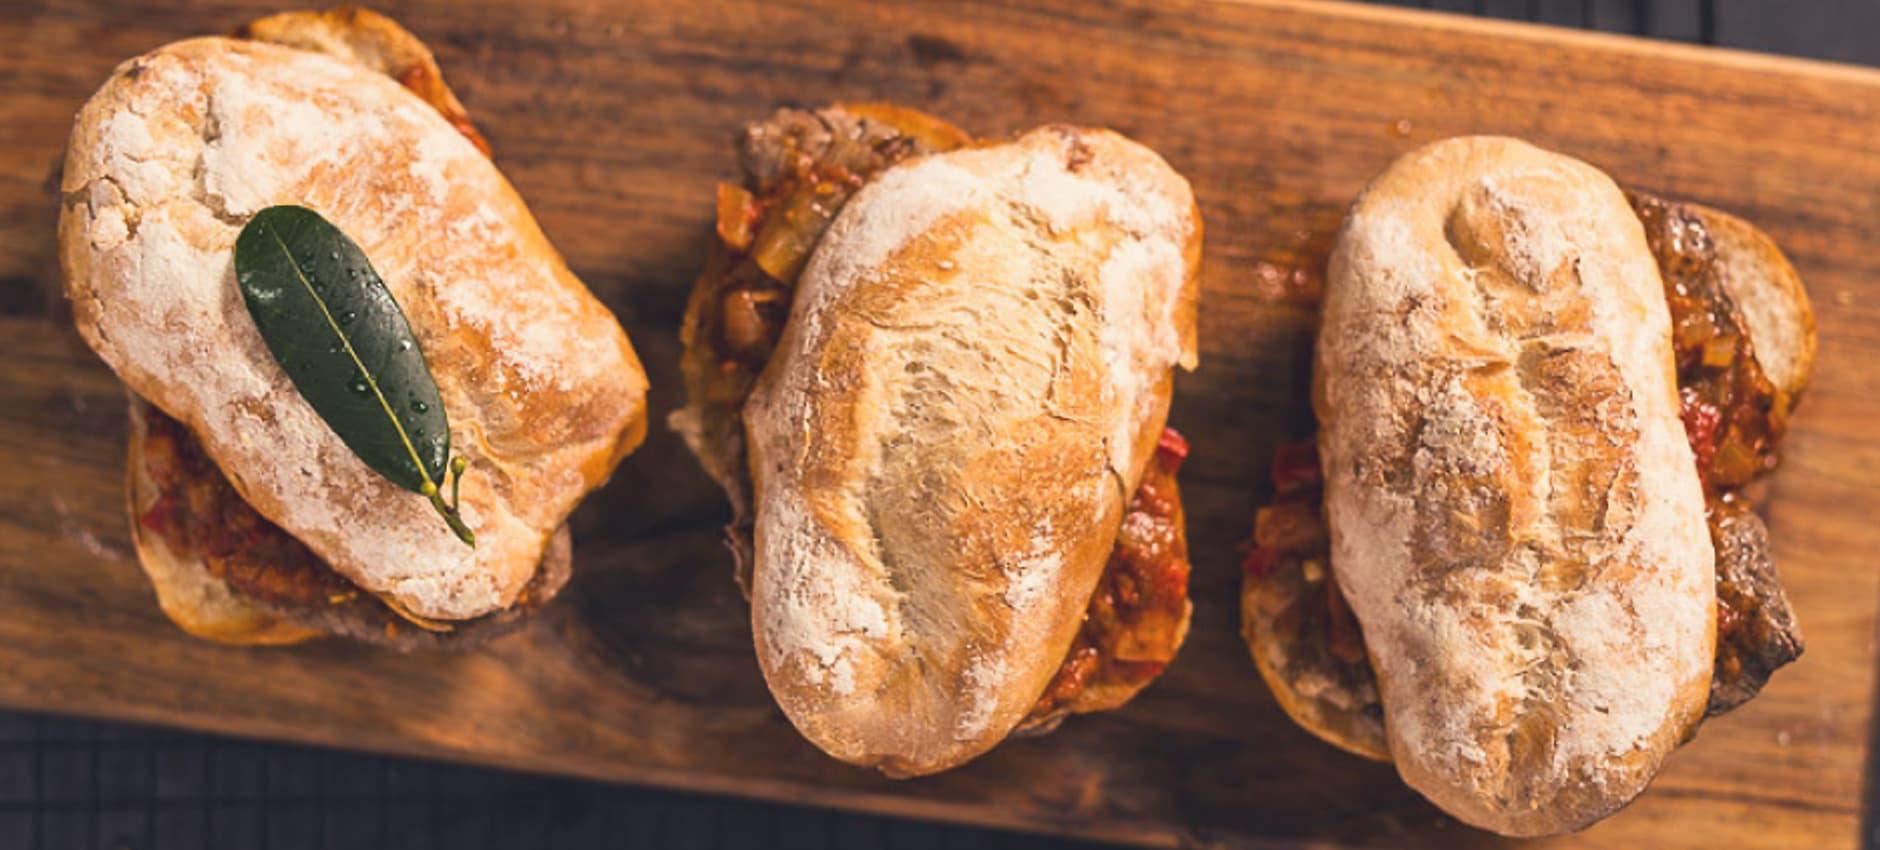 Oyster Steak Prego Rolls